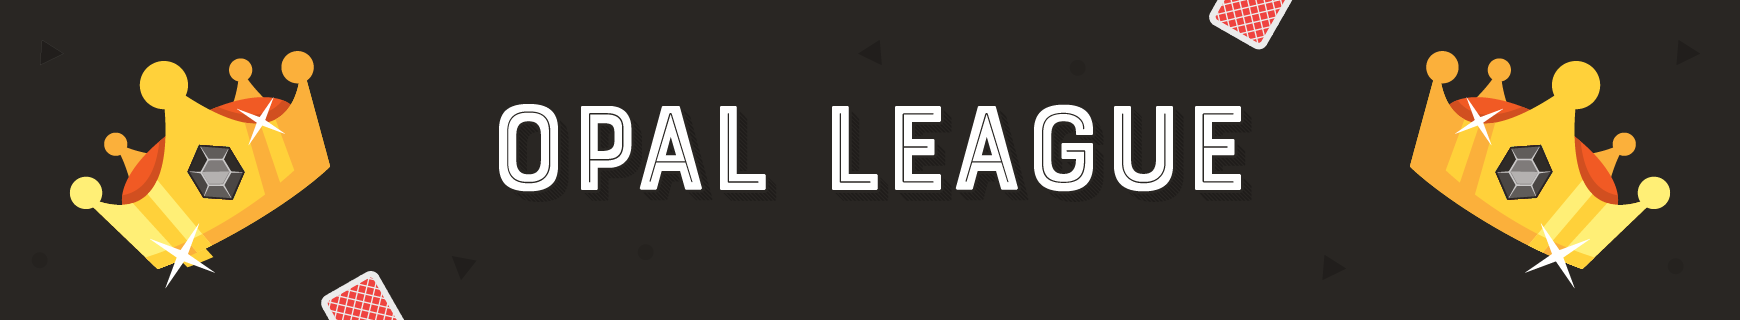 Opal league %28870 x 160%29 2x